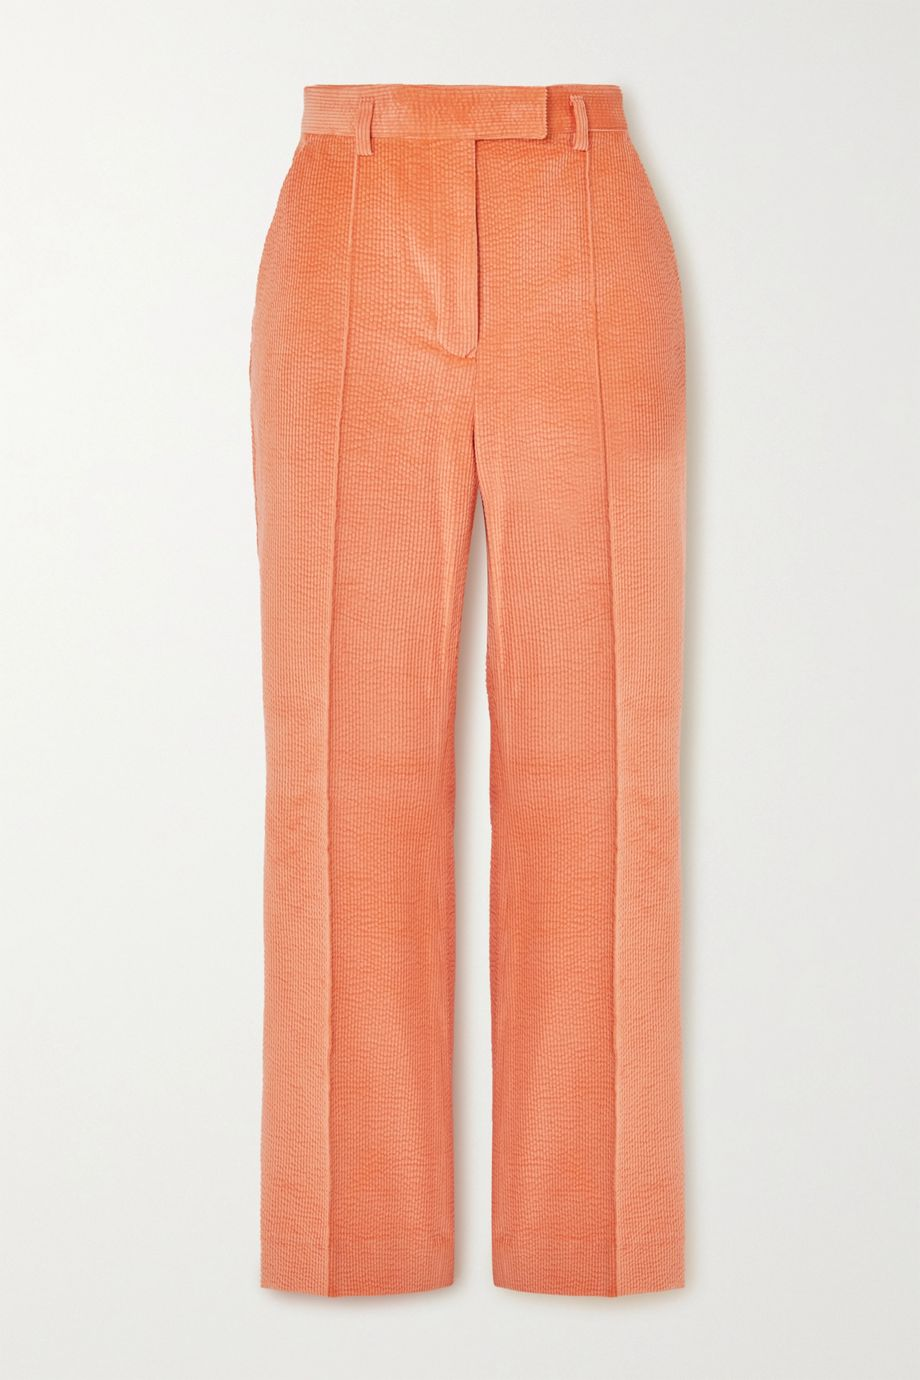 Acne Studios Cropped cotton-blend corduroy straight-leg pants